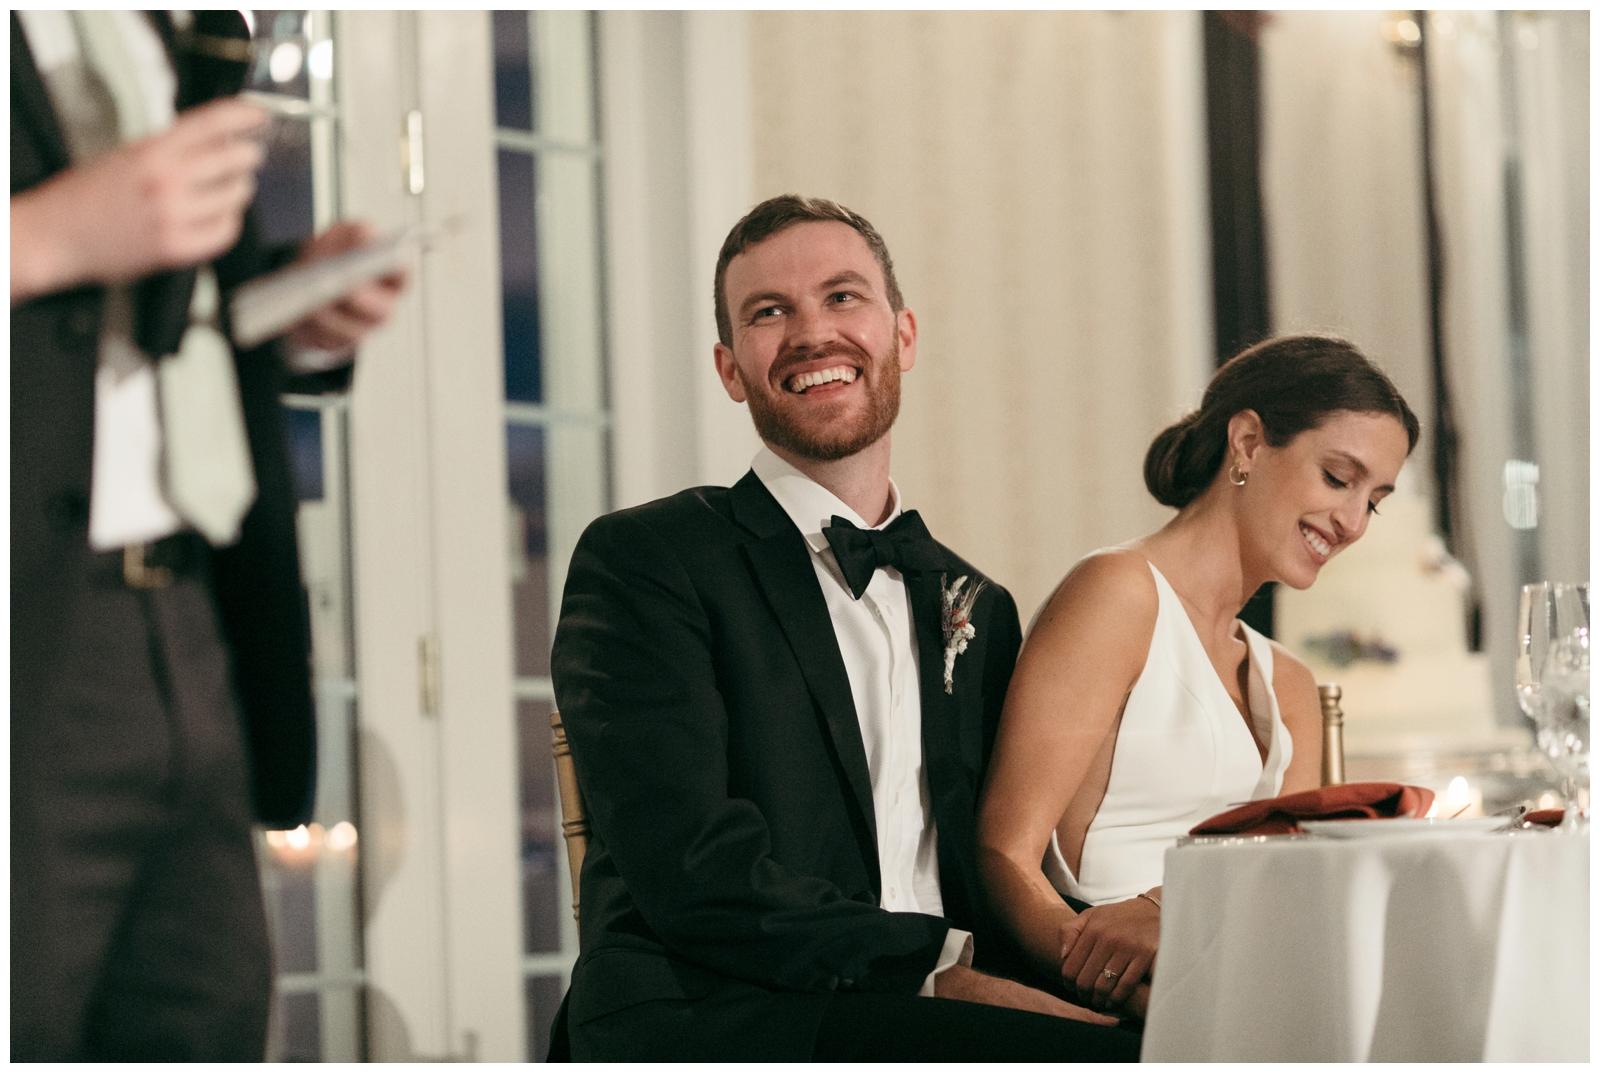 Madison-Beach-Hotel-Wedding-Bailey-Q-Photo-Boston-Wedding-Photographer-067.jpg